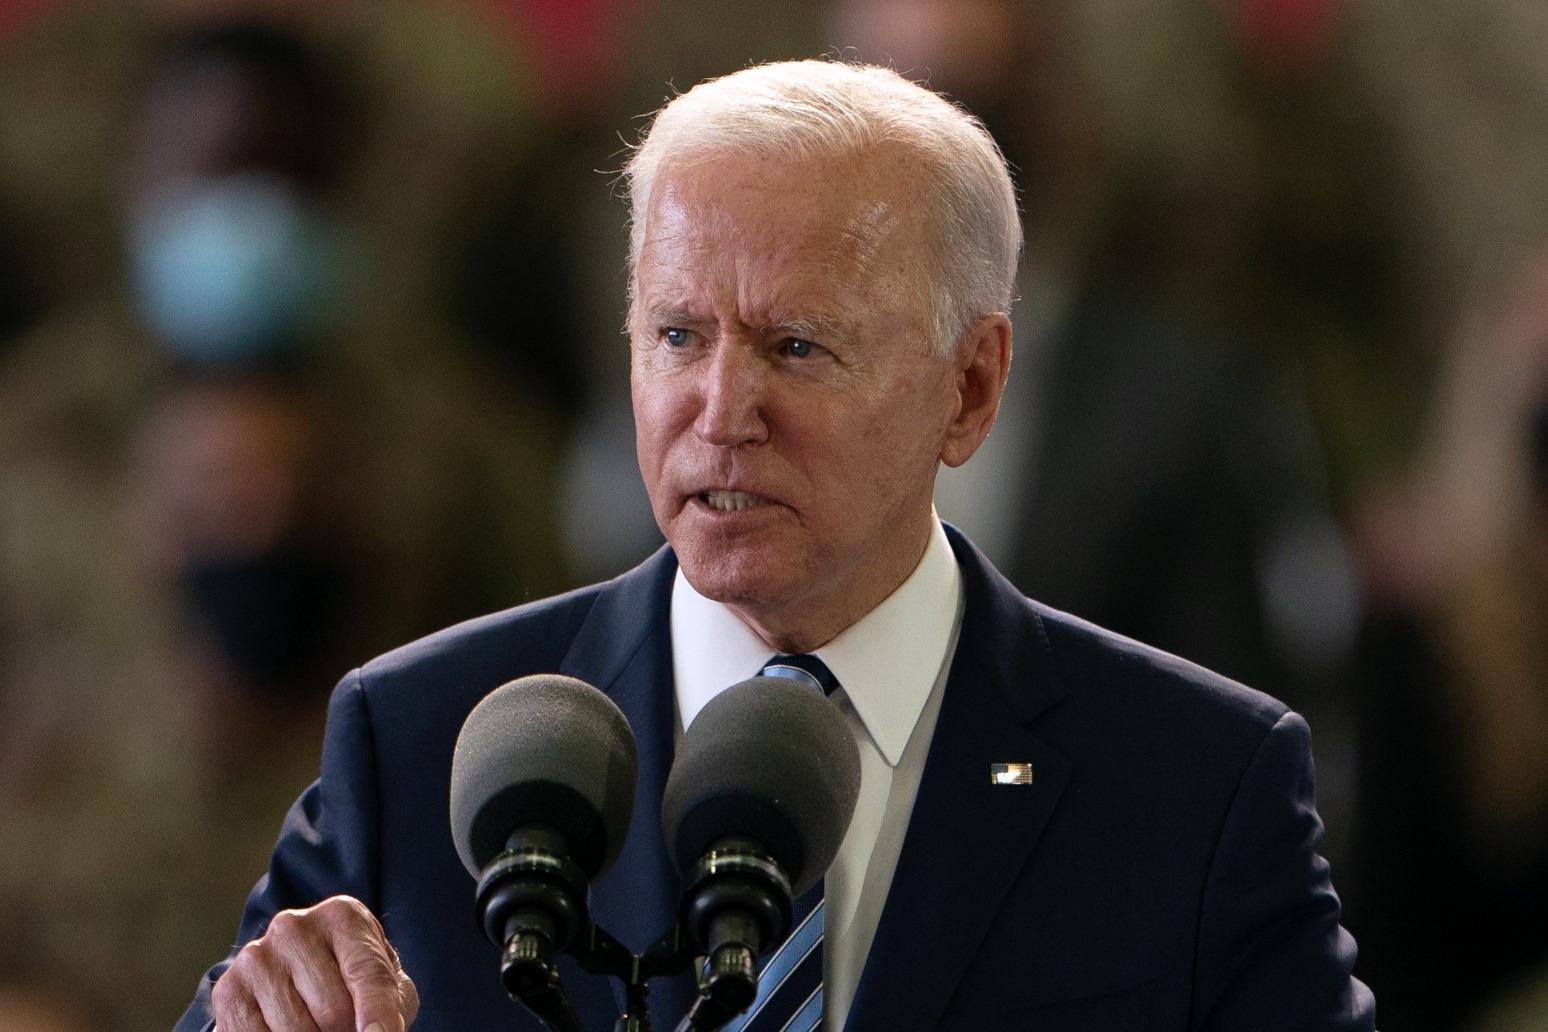 Joe Biden given warm welcome in UK on first overseas trip as US President